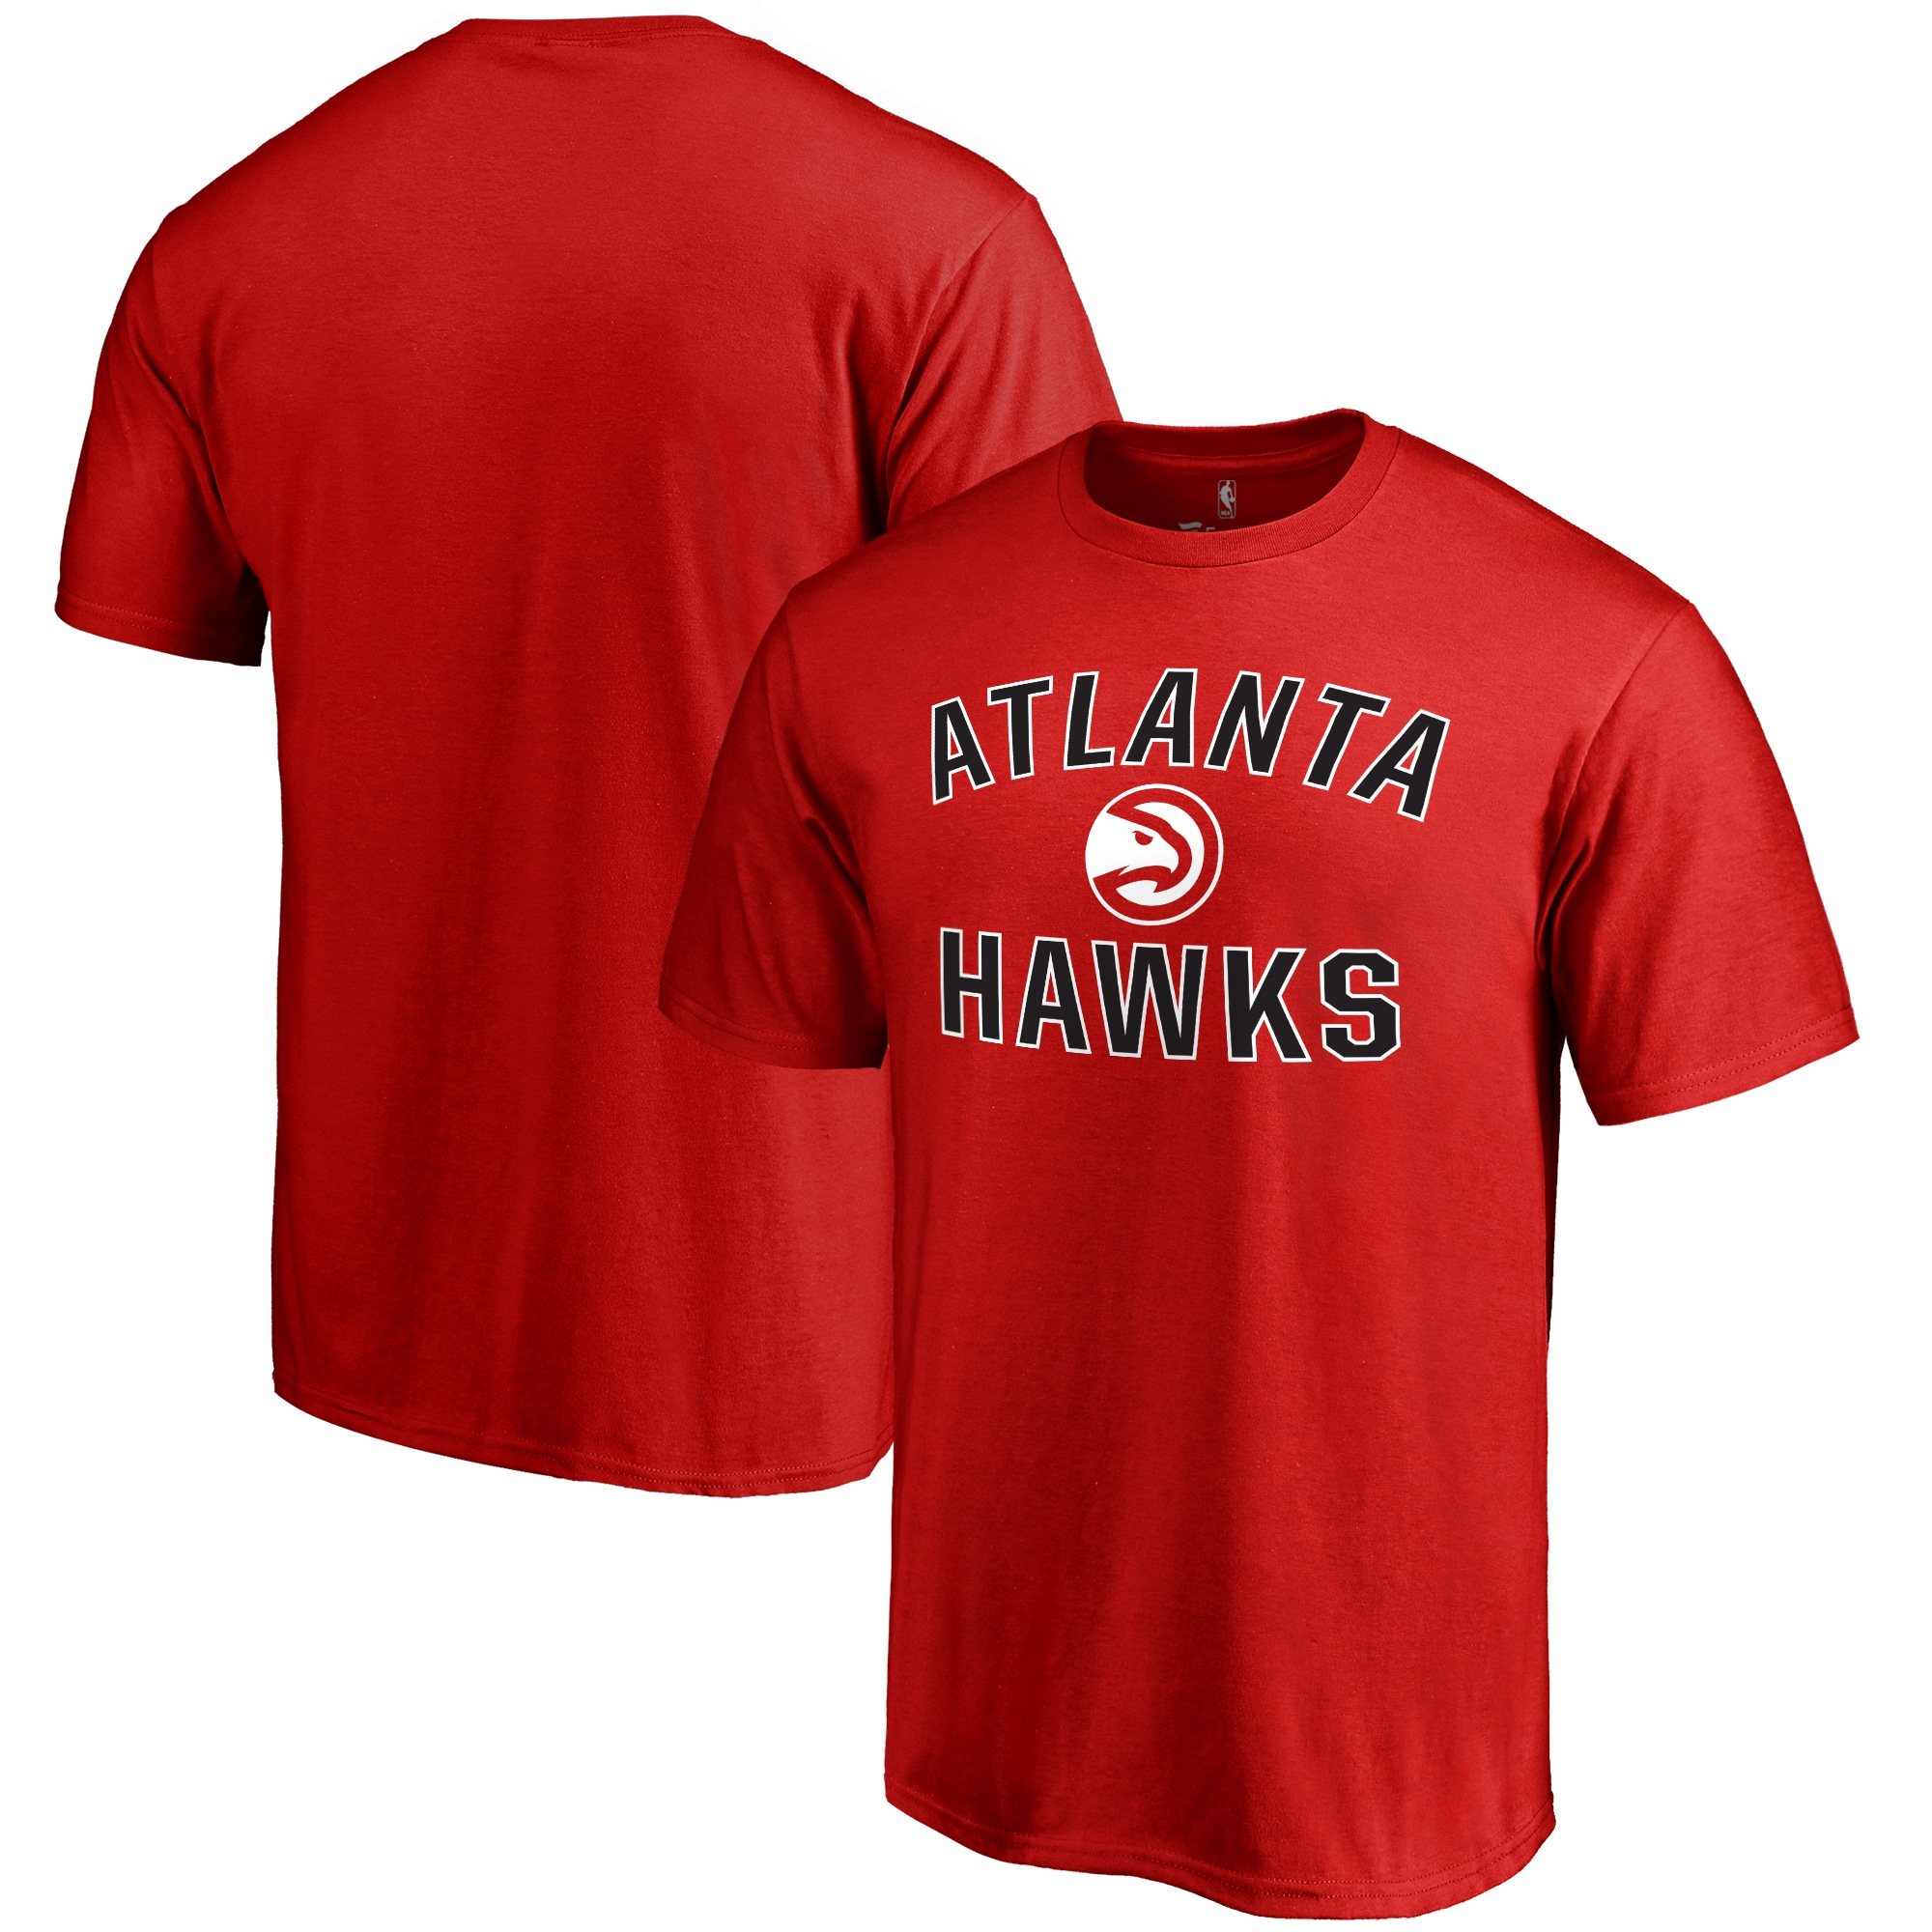 Atlanta Hawks Big & Tall Victory Arch T-Shirt - Red